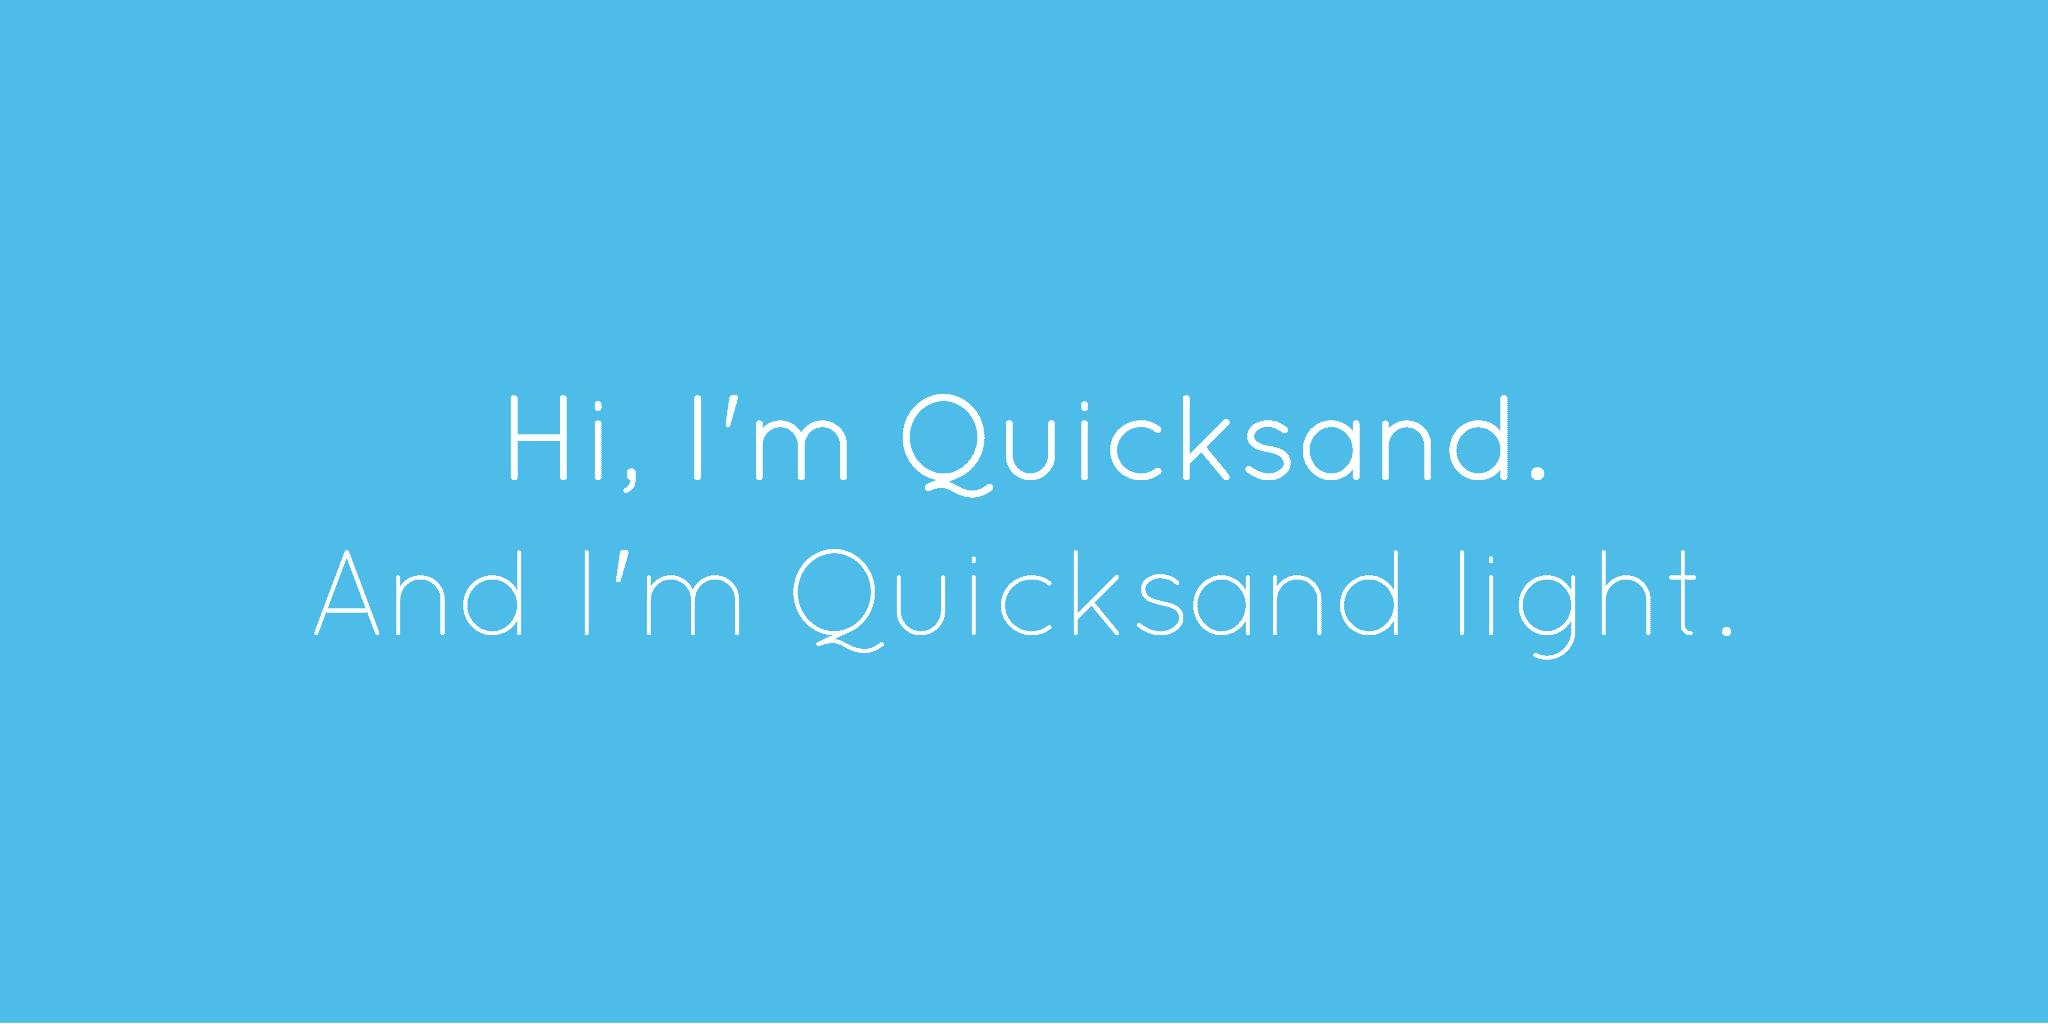 Font variants